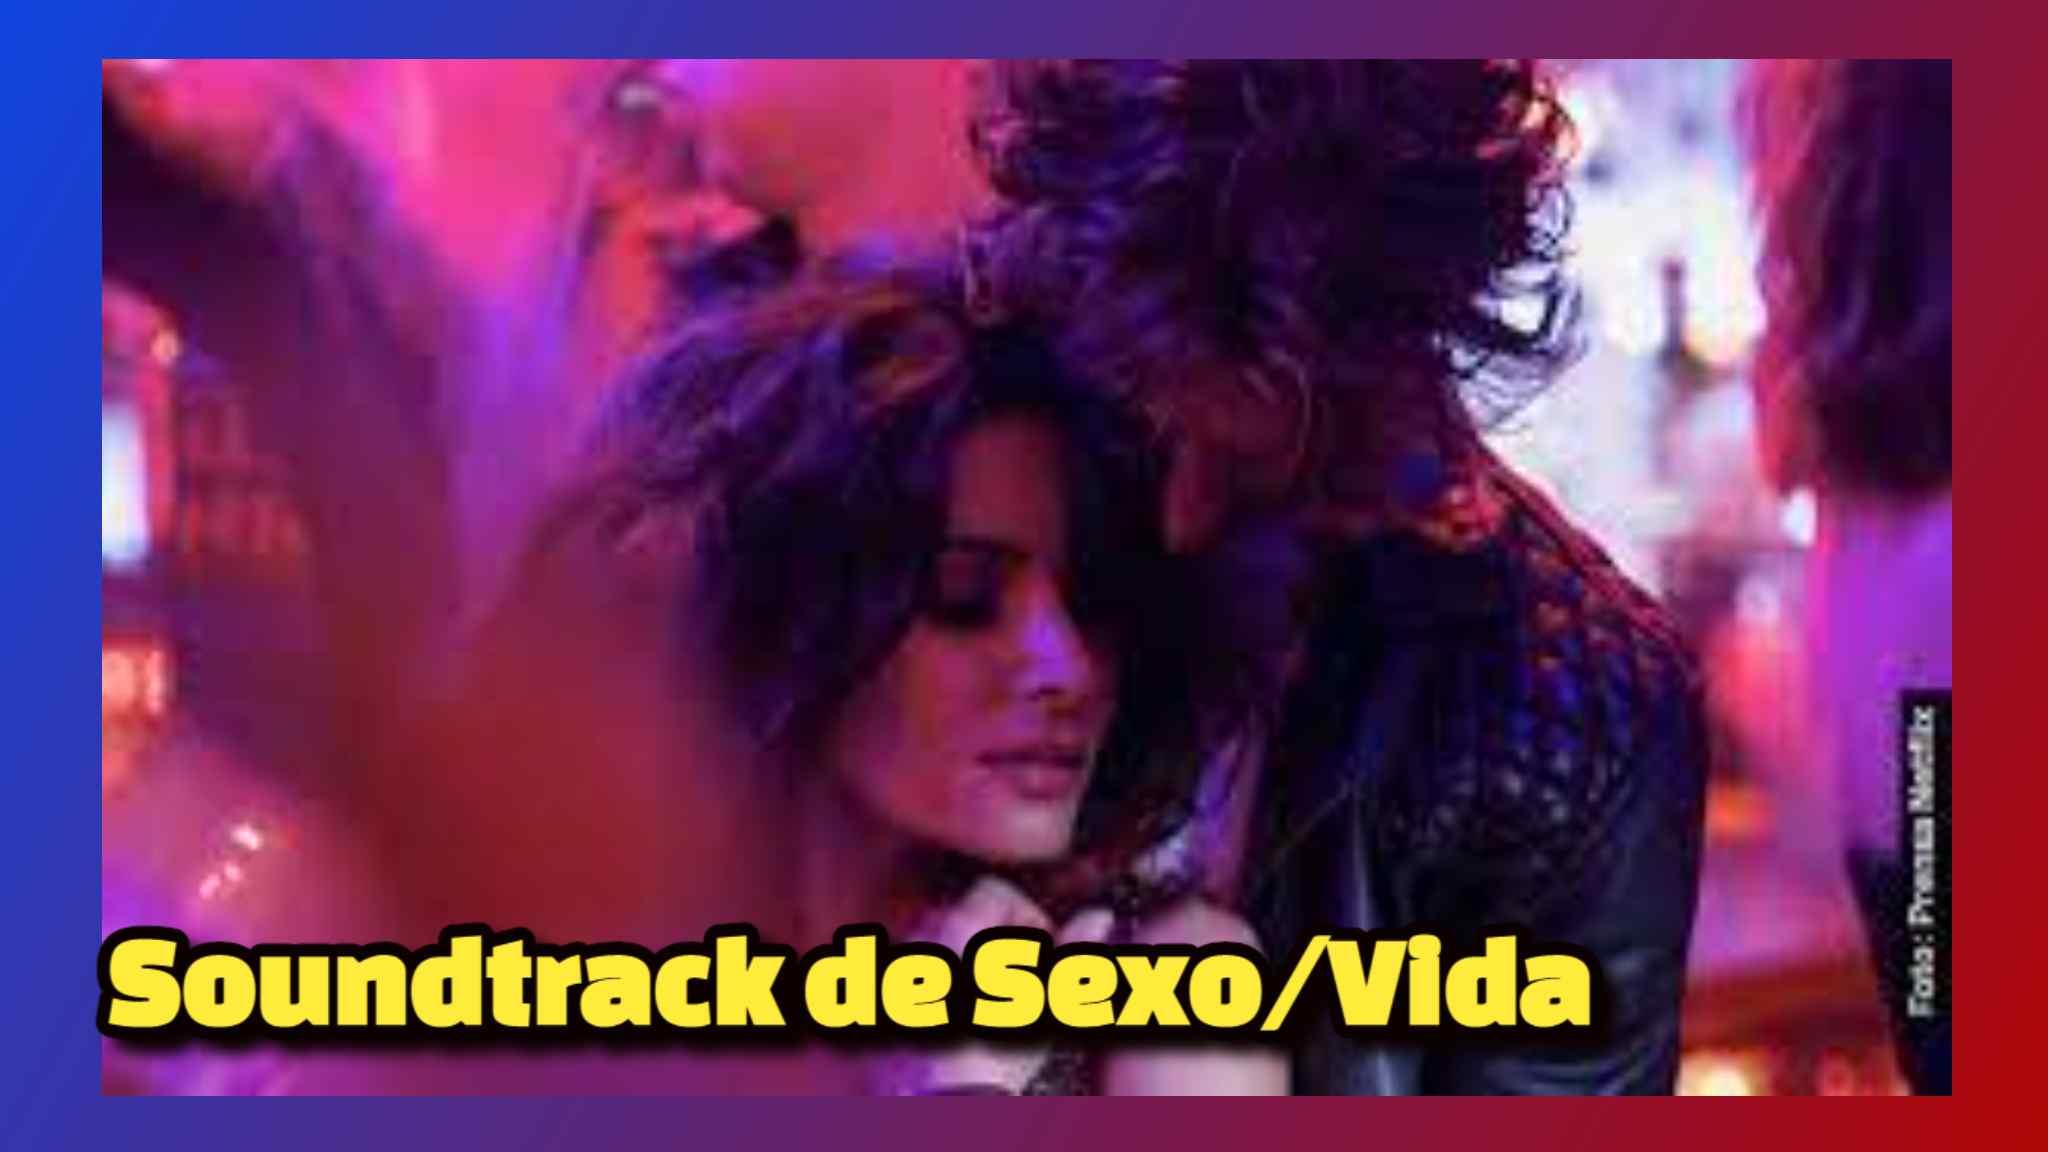 Soundtrack de Sexo/Vida